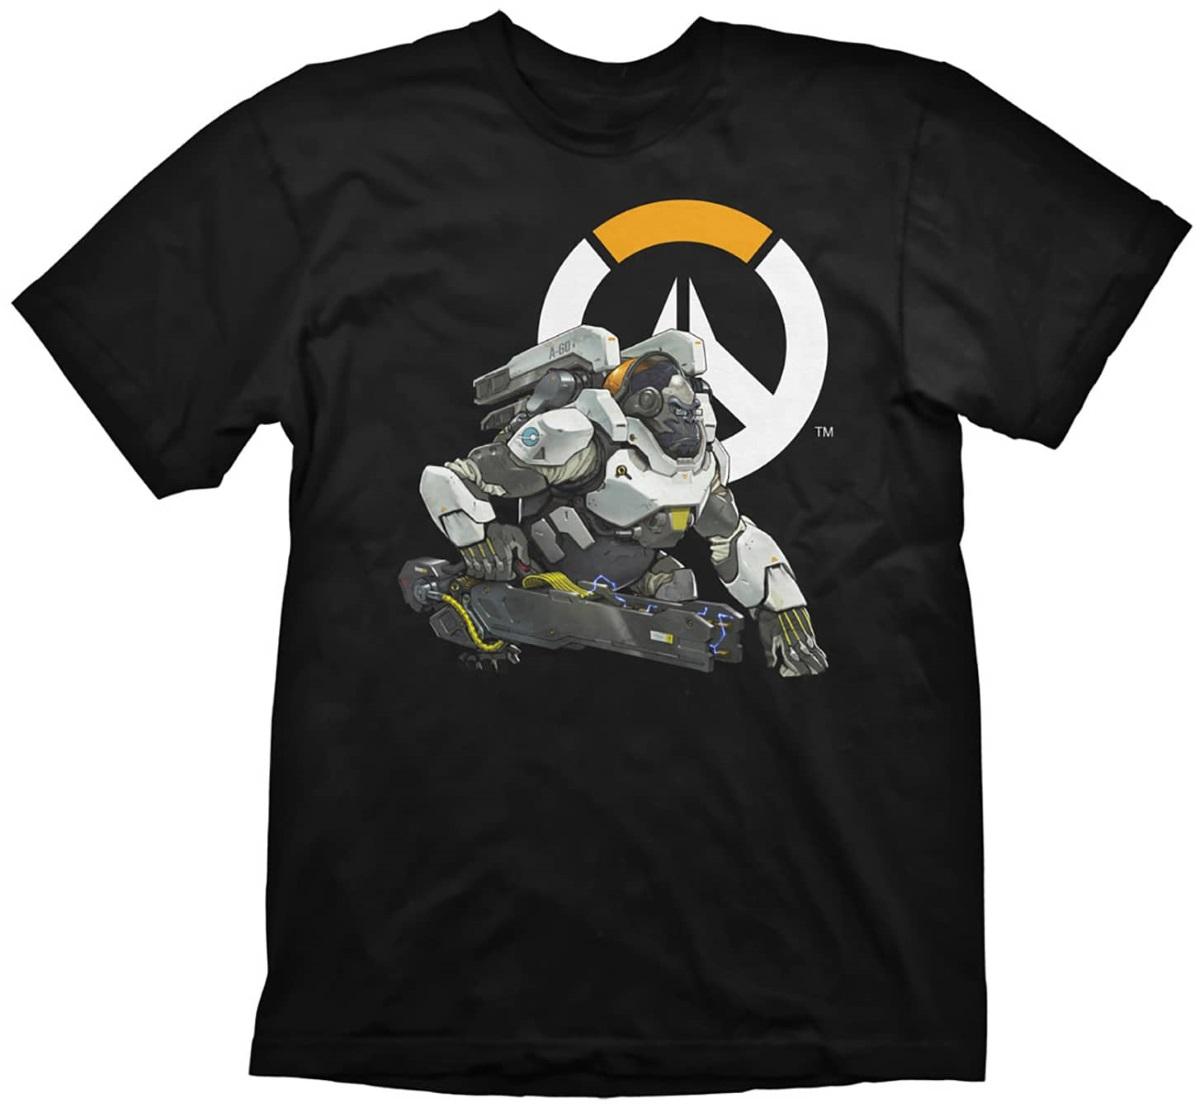 Футболка Overwatch: Winston Logo (черная)На футболке Overwatch: Winston Logo черного цвета размера S изображен Уинстон на фоне логотипа игры.<br>